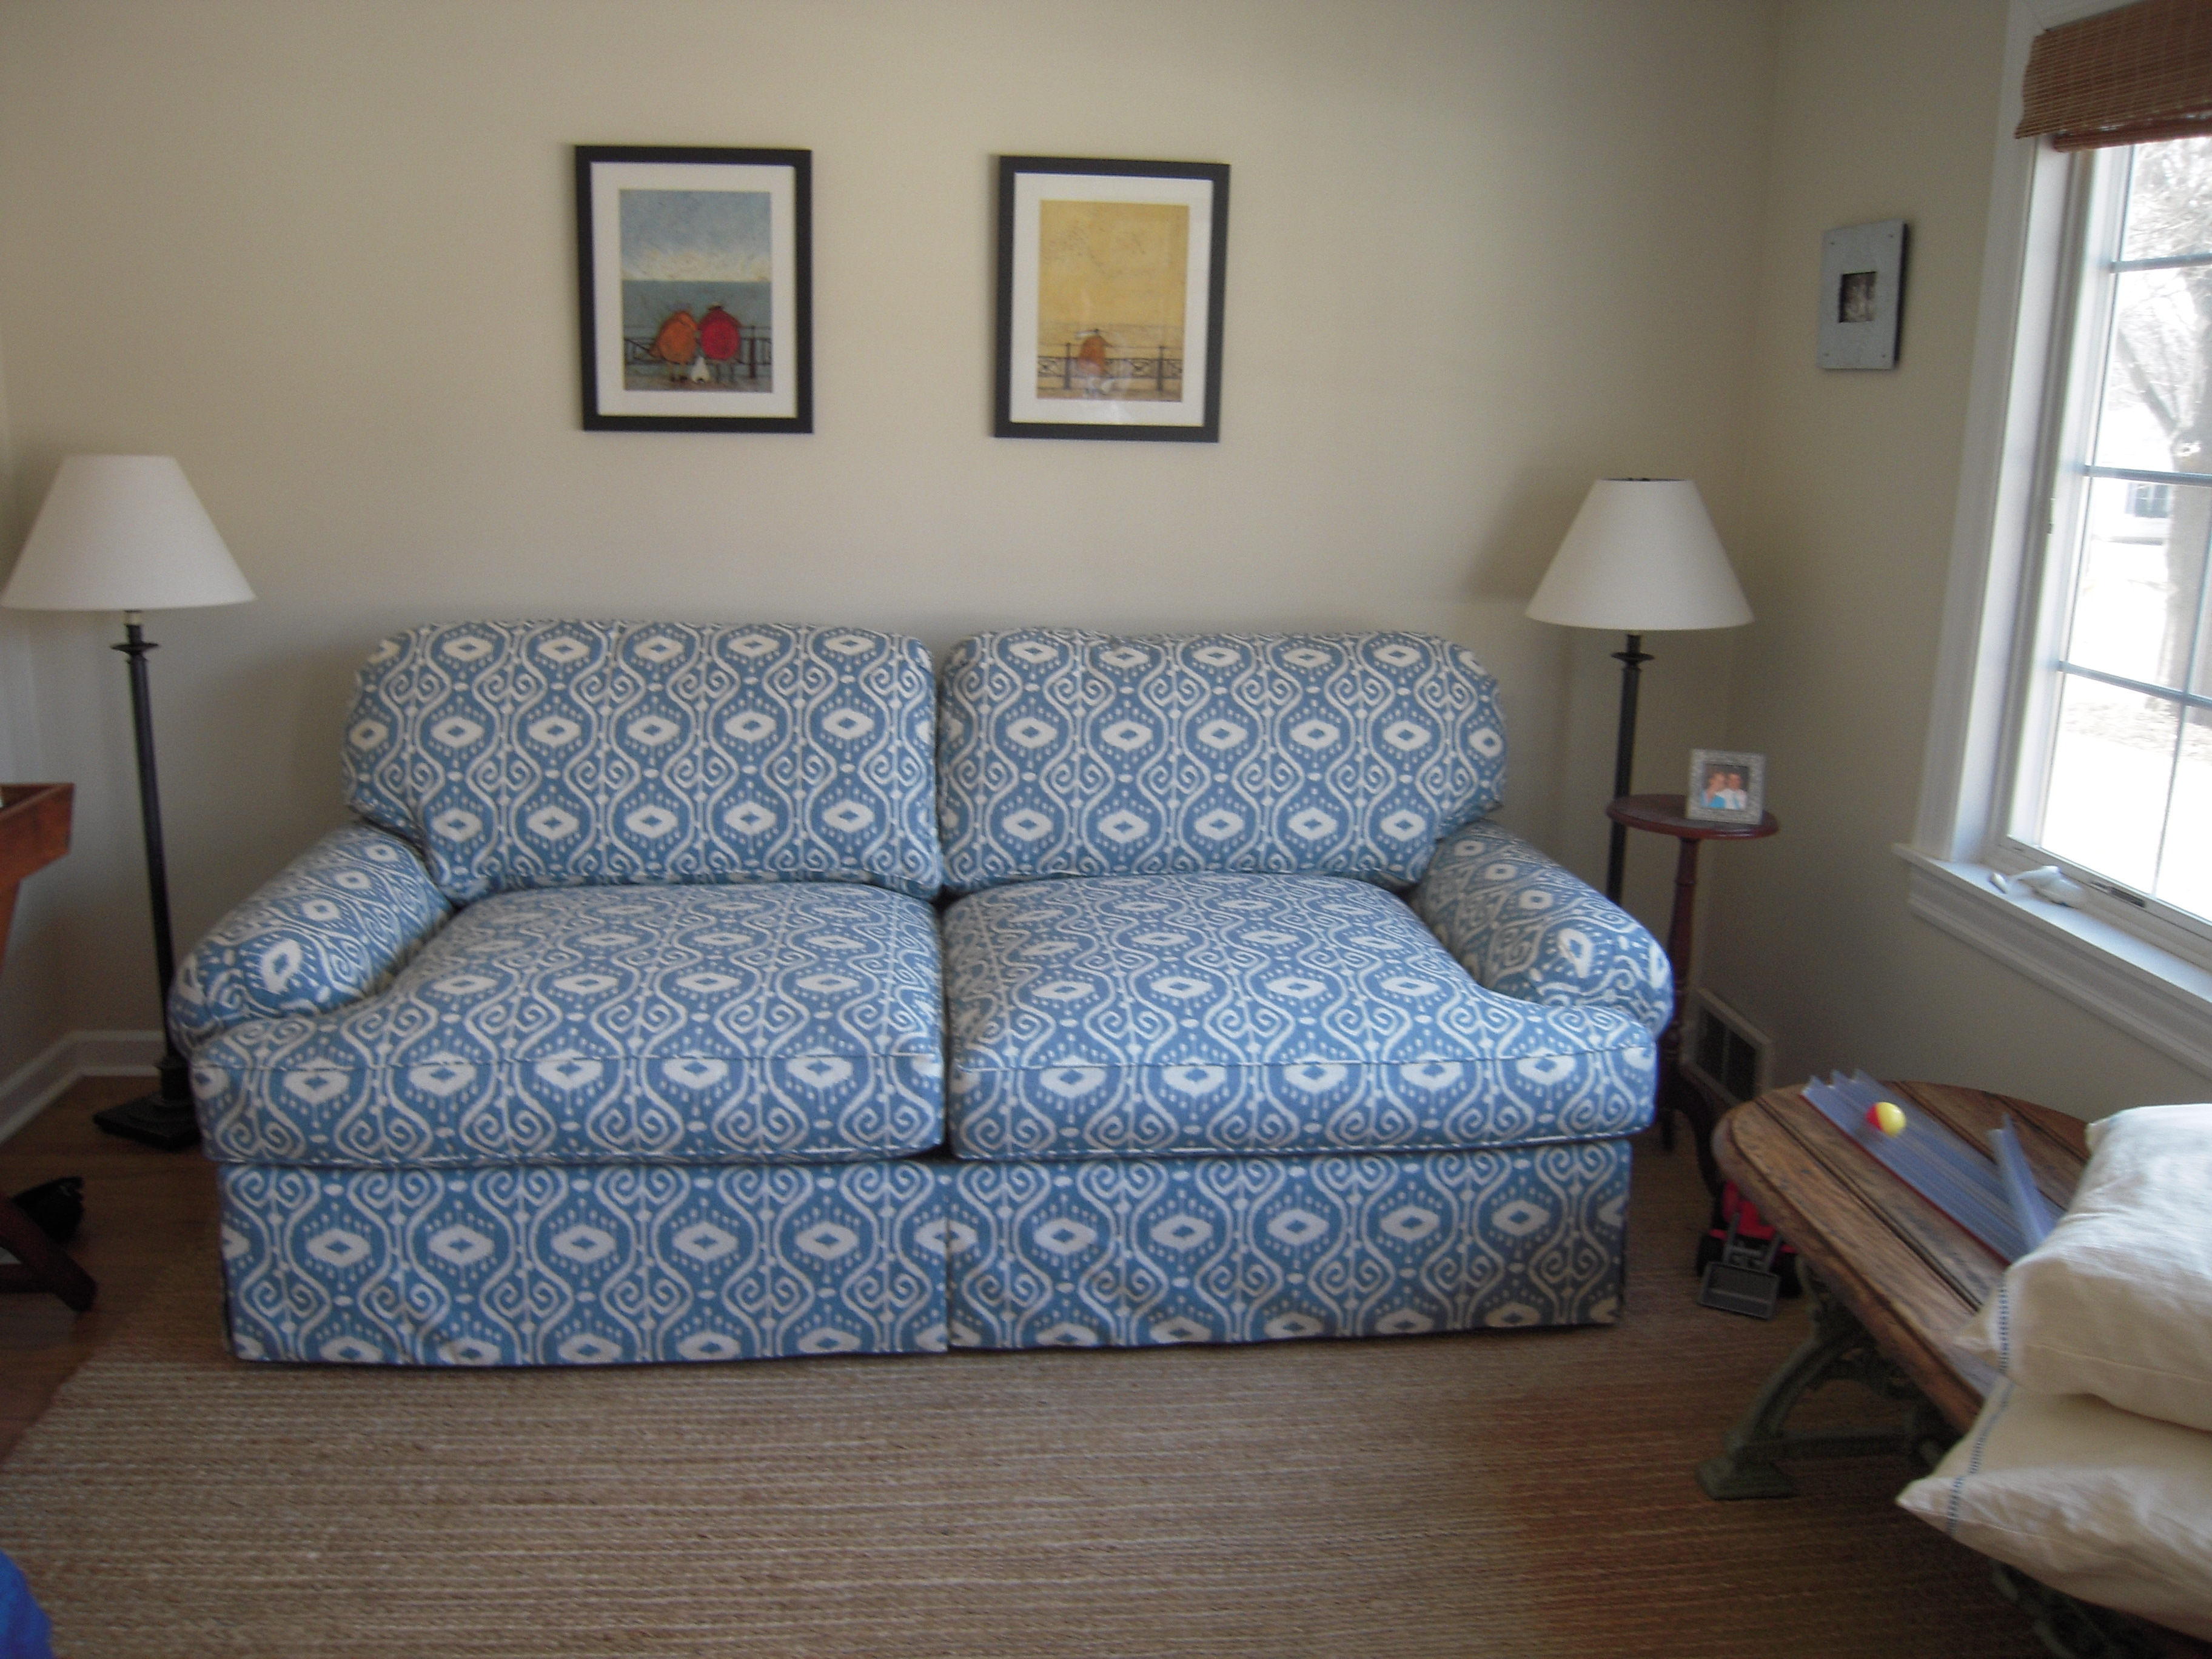 Couch B 03.JPG